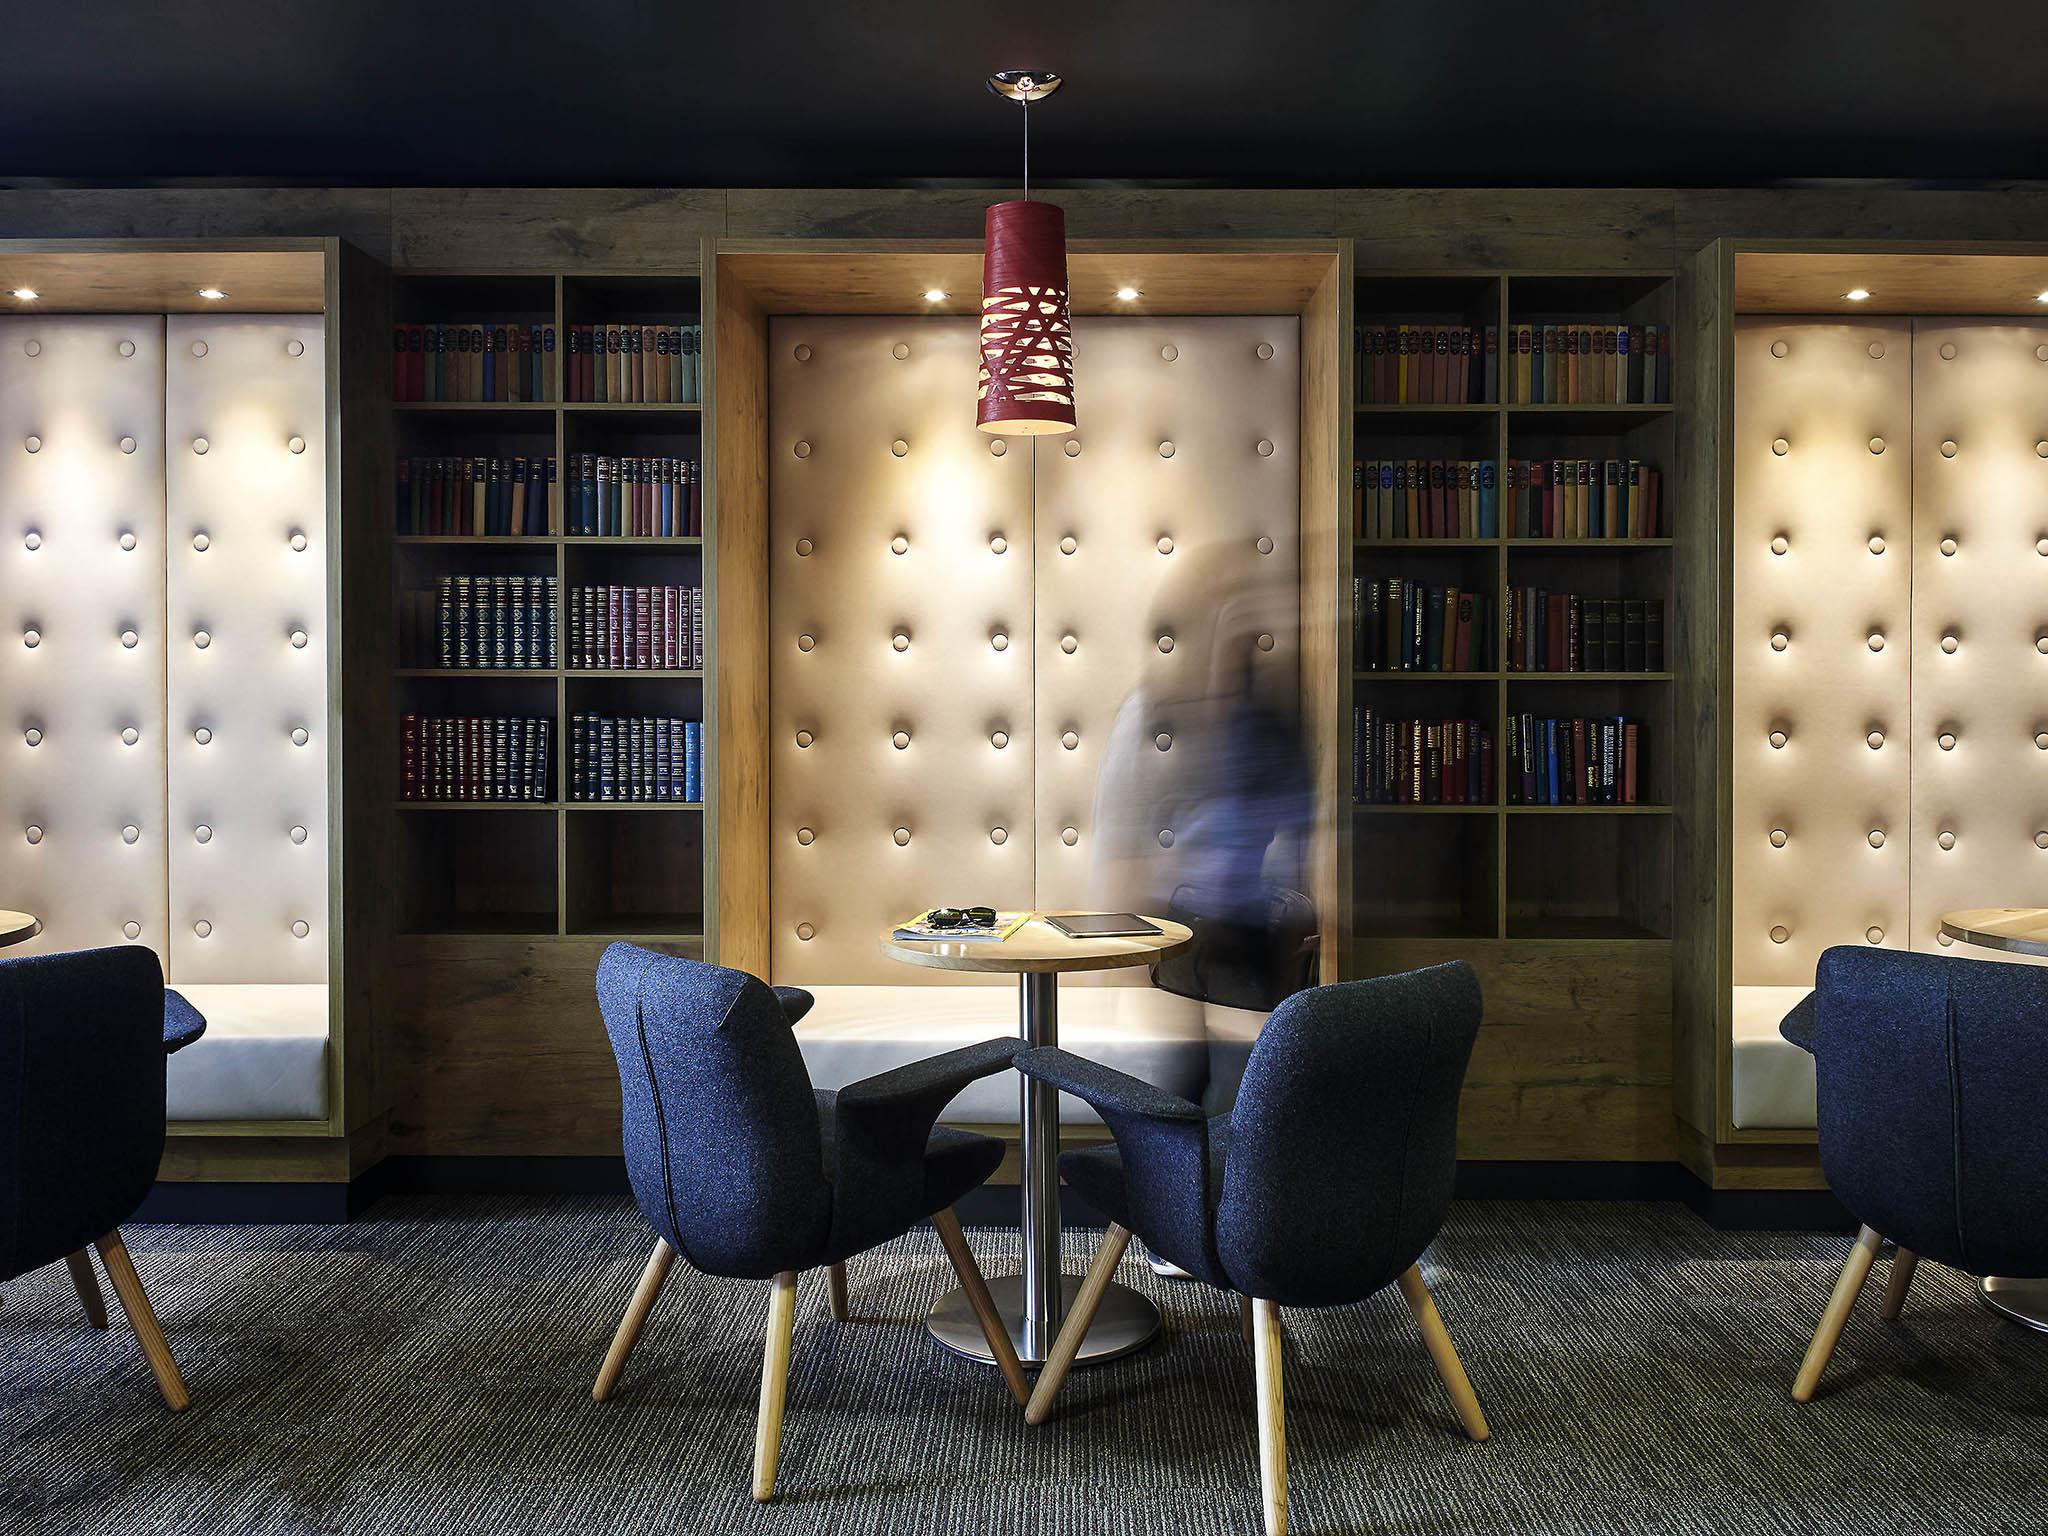 Ibis Swansea Comfortable Modern Hotel In Swansea